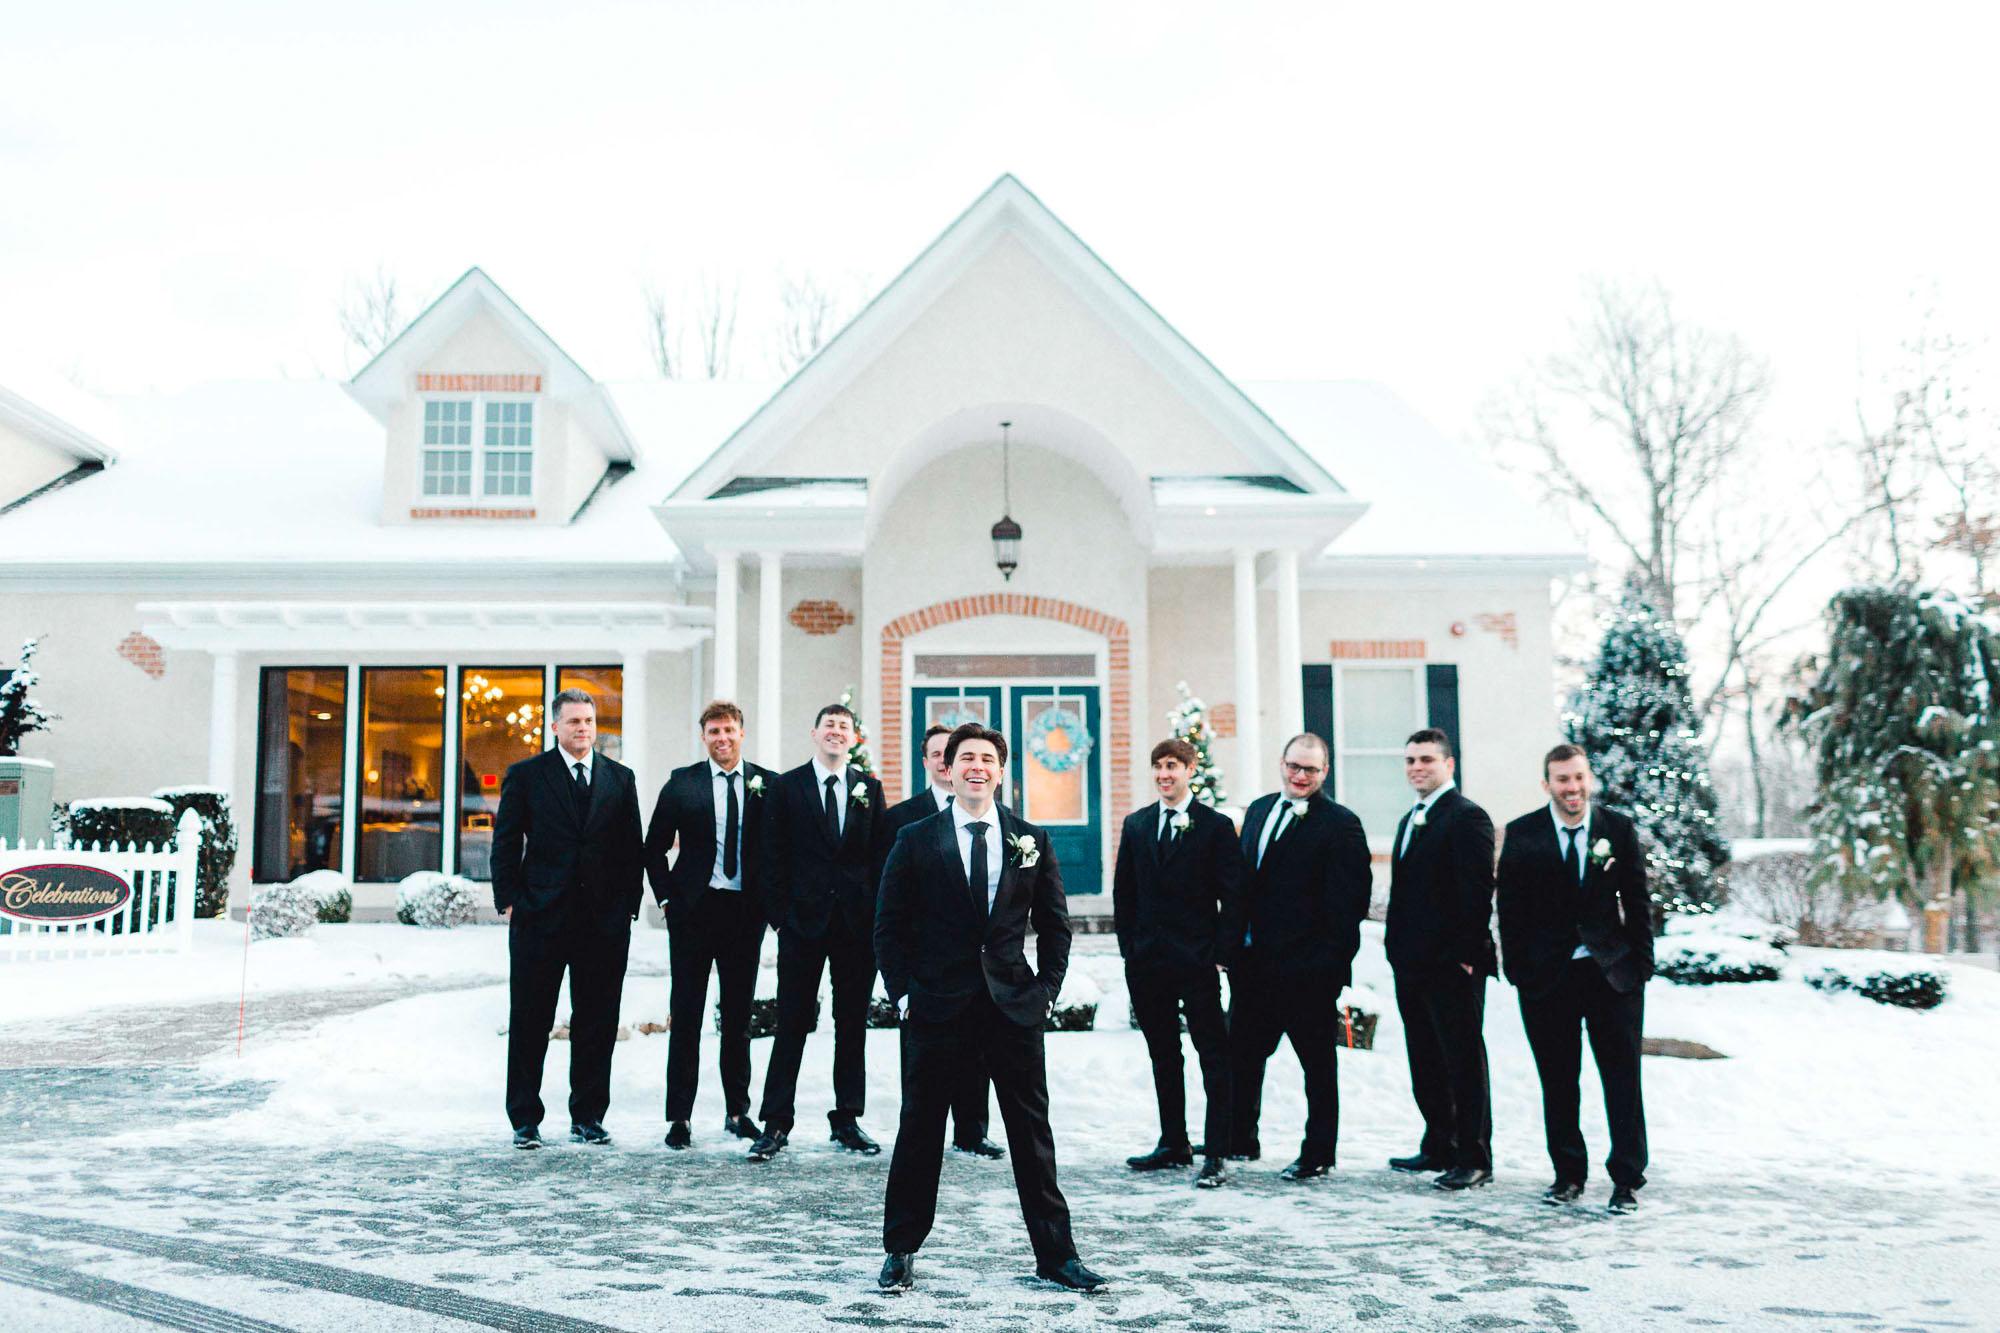 snowy-sand-springs-country-club-drums-pa-christmas-wedding-34974.jpg